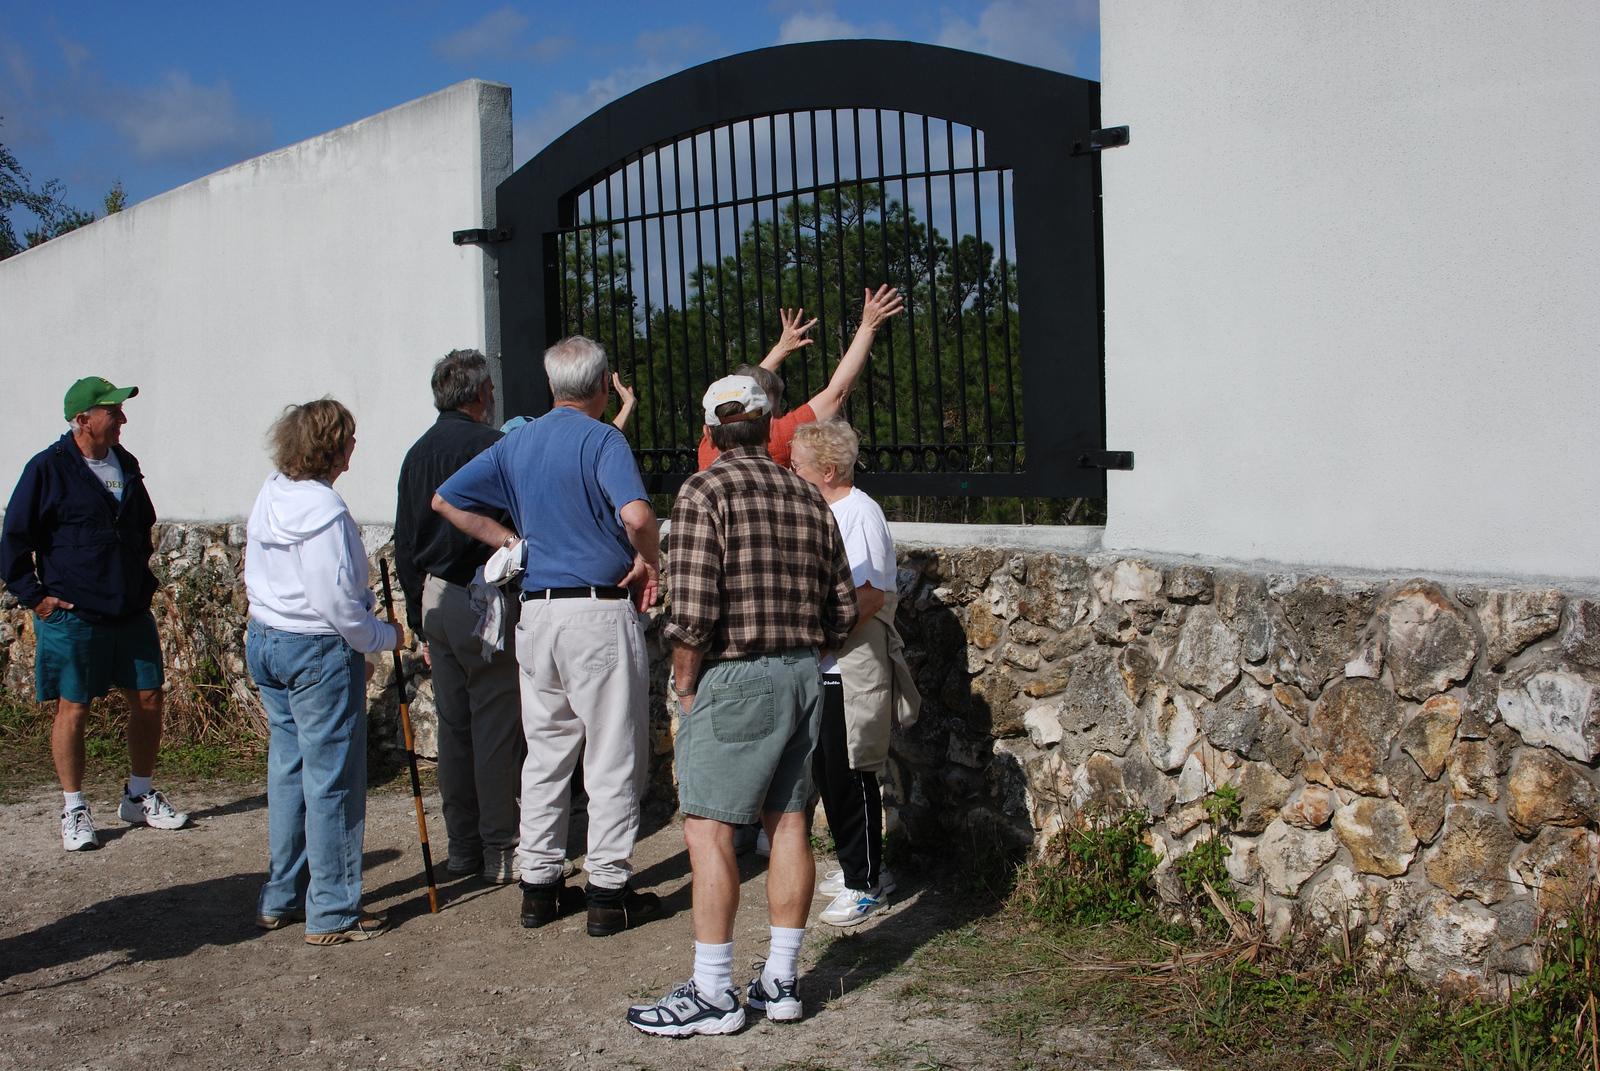 Land Bridge over I-75 <br /> PHOTO CREDIT: Florida Trail Association / Diane Dammiller